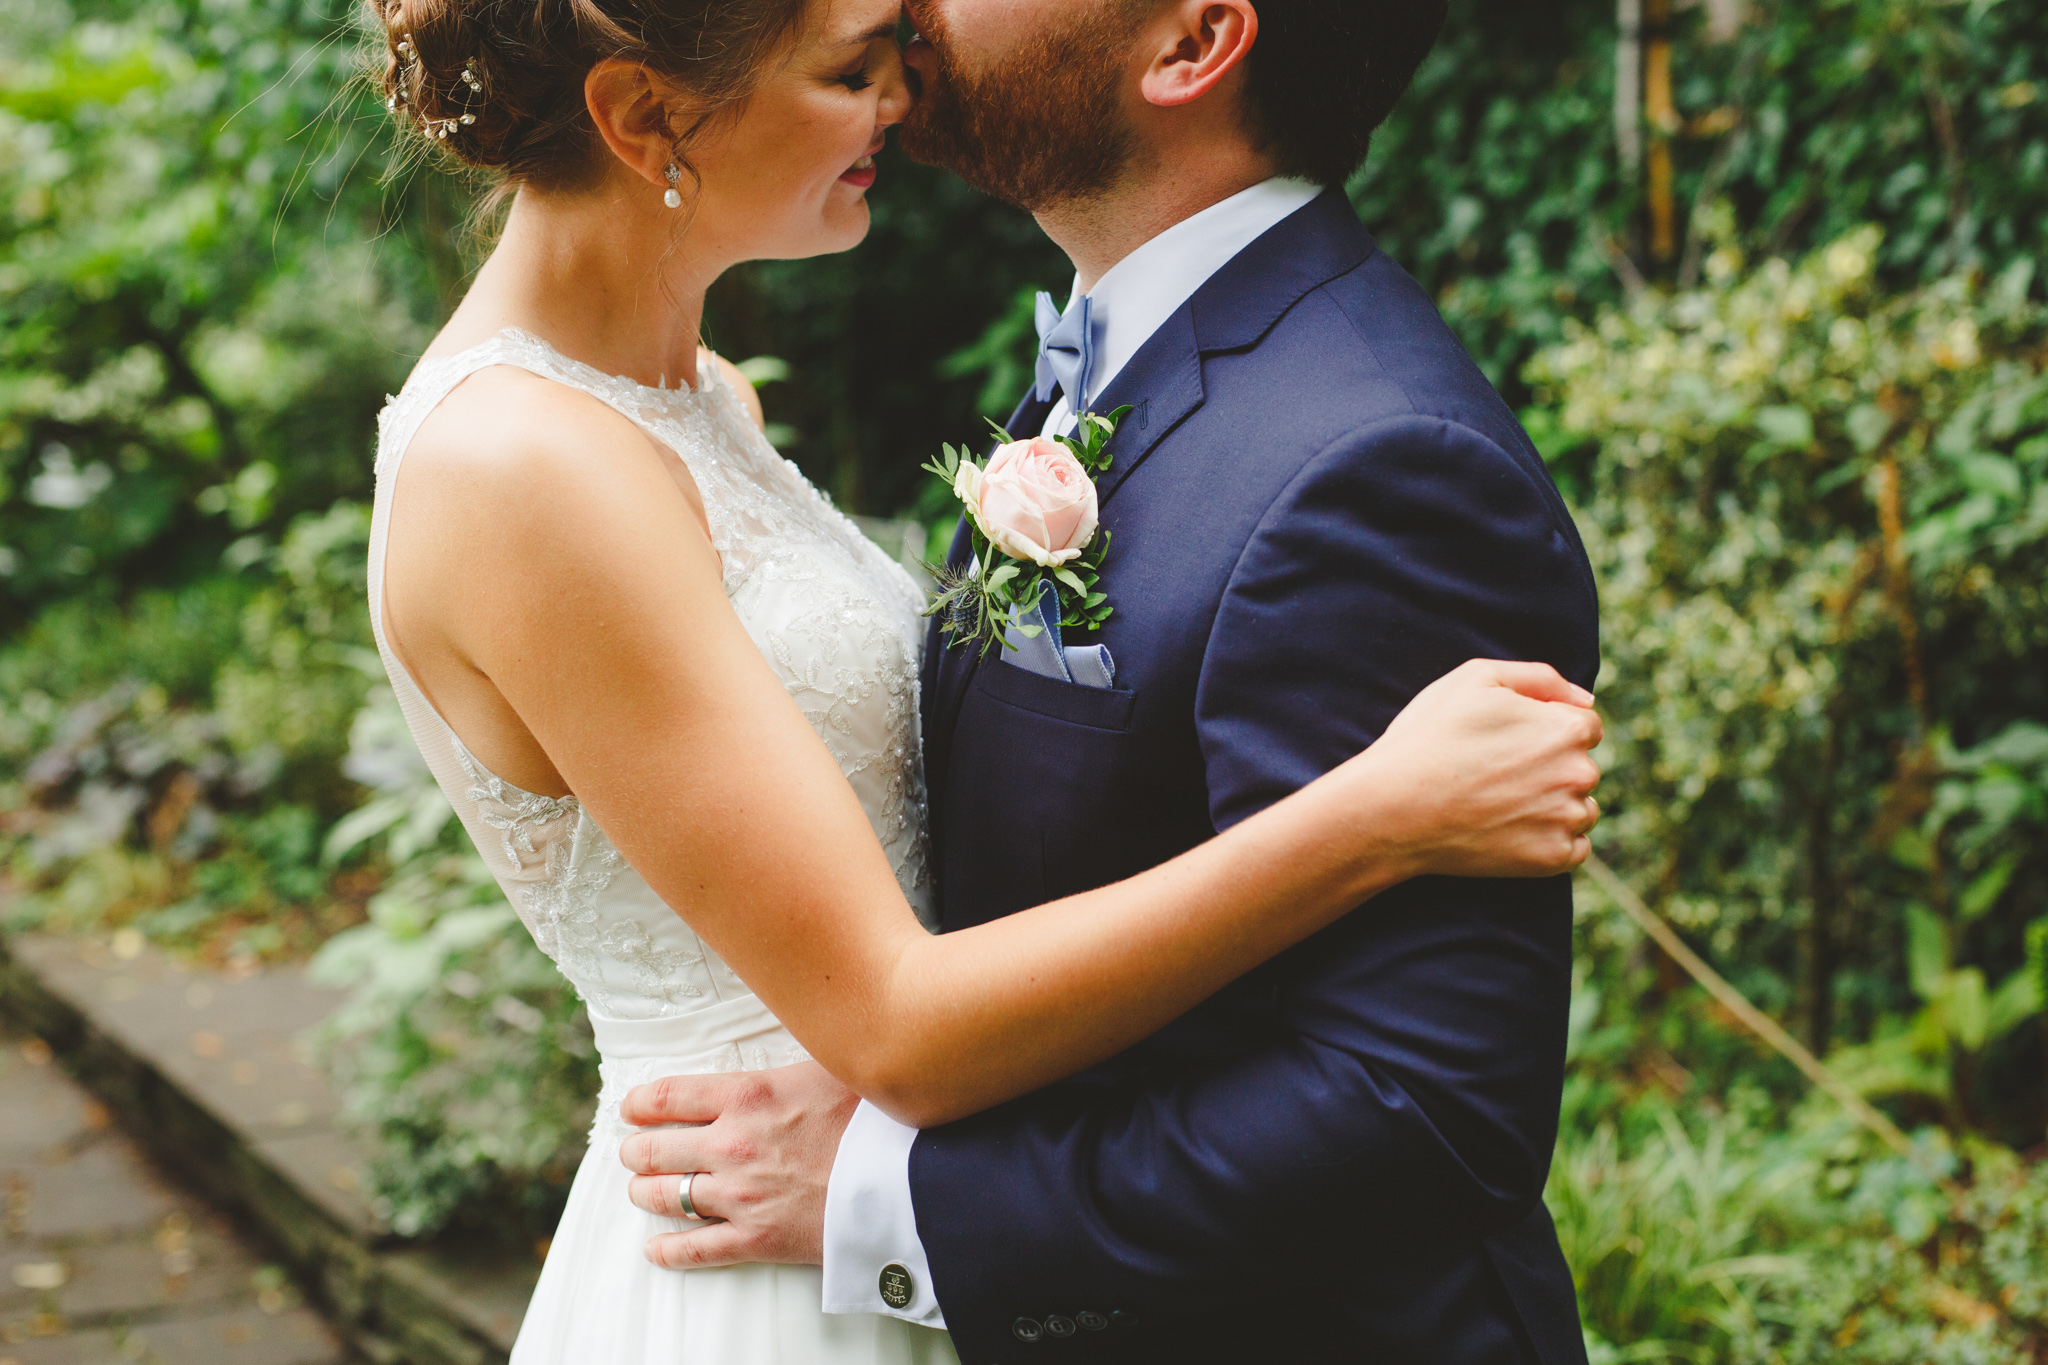 quirky-wedding-photography-camera-hannah-2.jpg